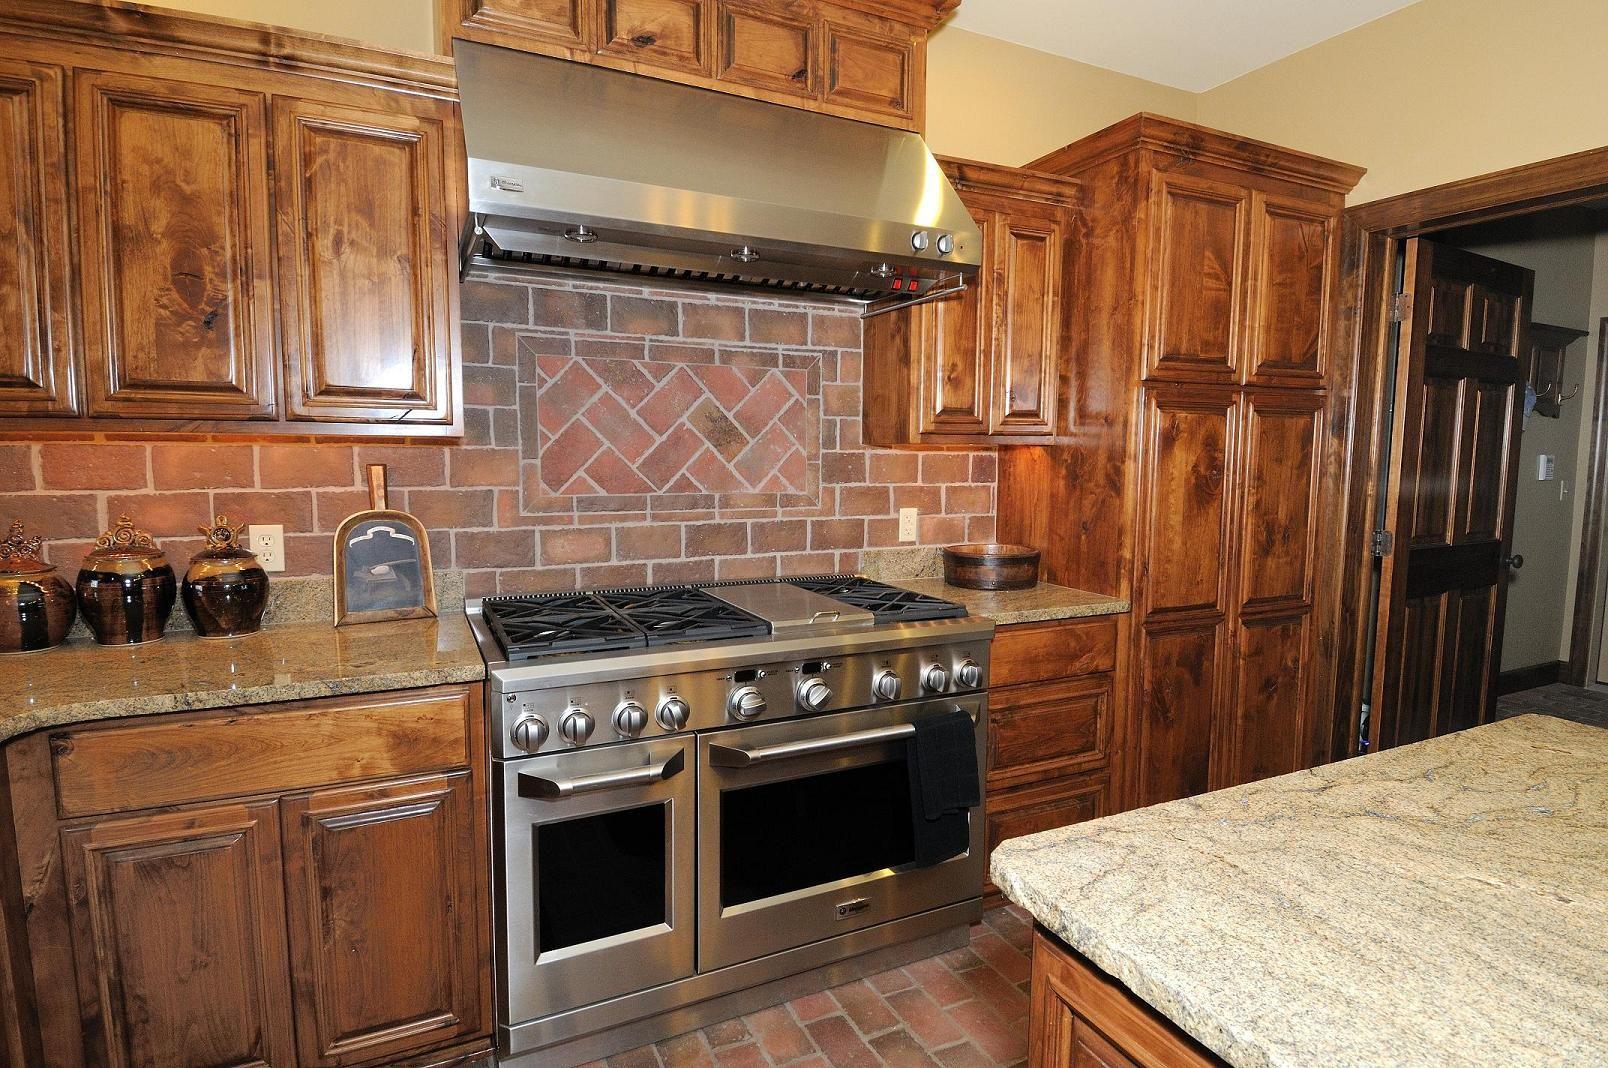 - Brick Kitchen Backsplash The King Street Tiles Also Cover The